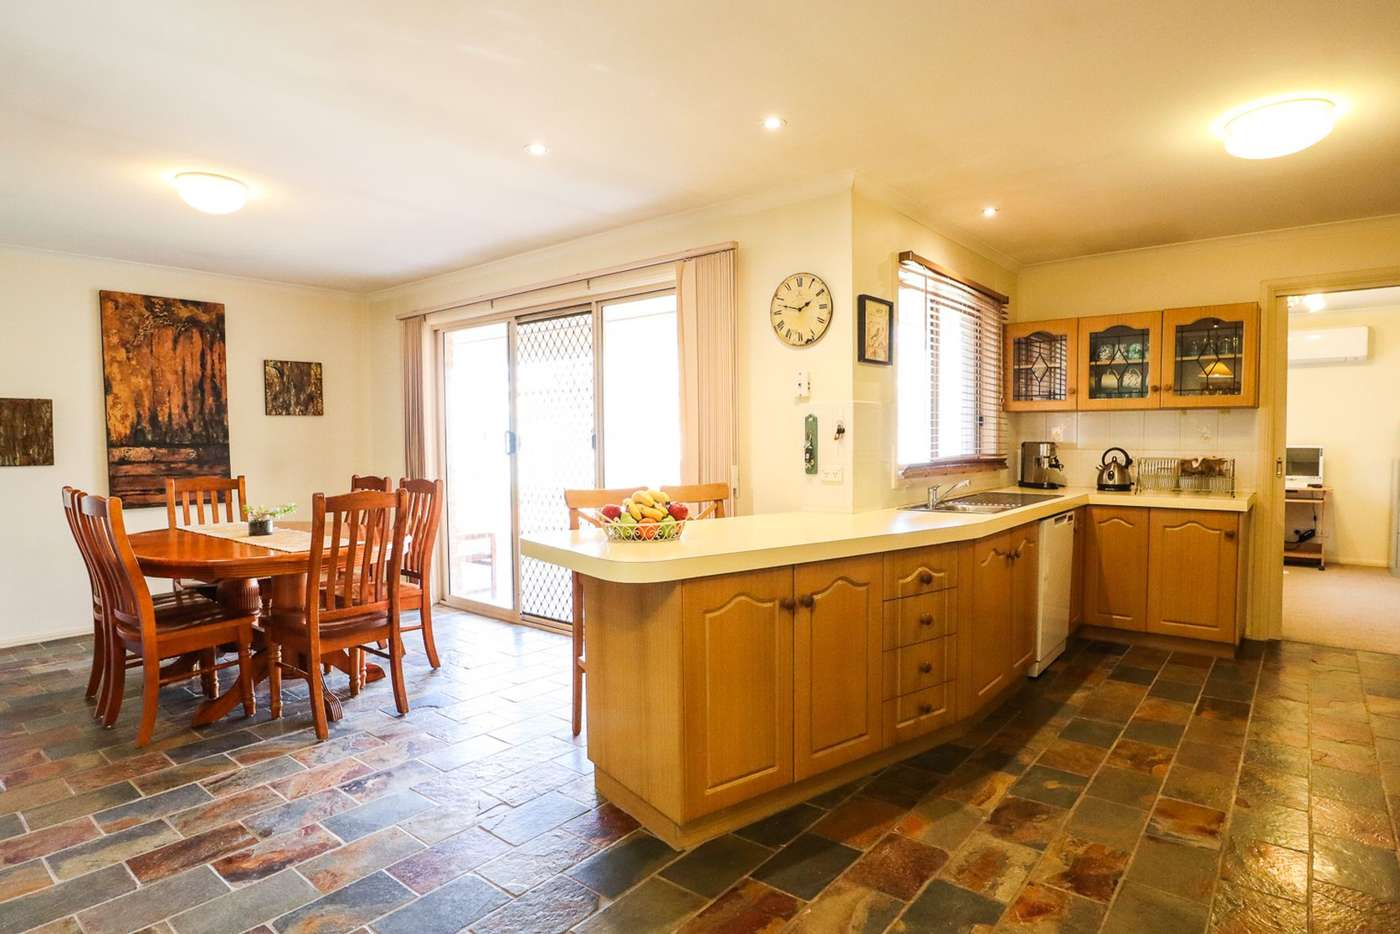 Seventh view of Homely house listing, 10 Patricia Drive, Mildura VIC 3500